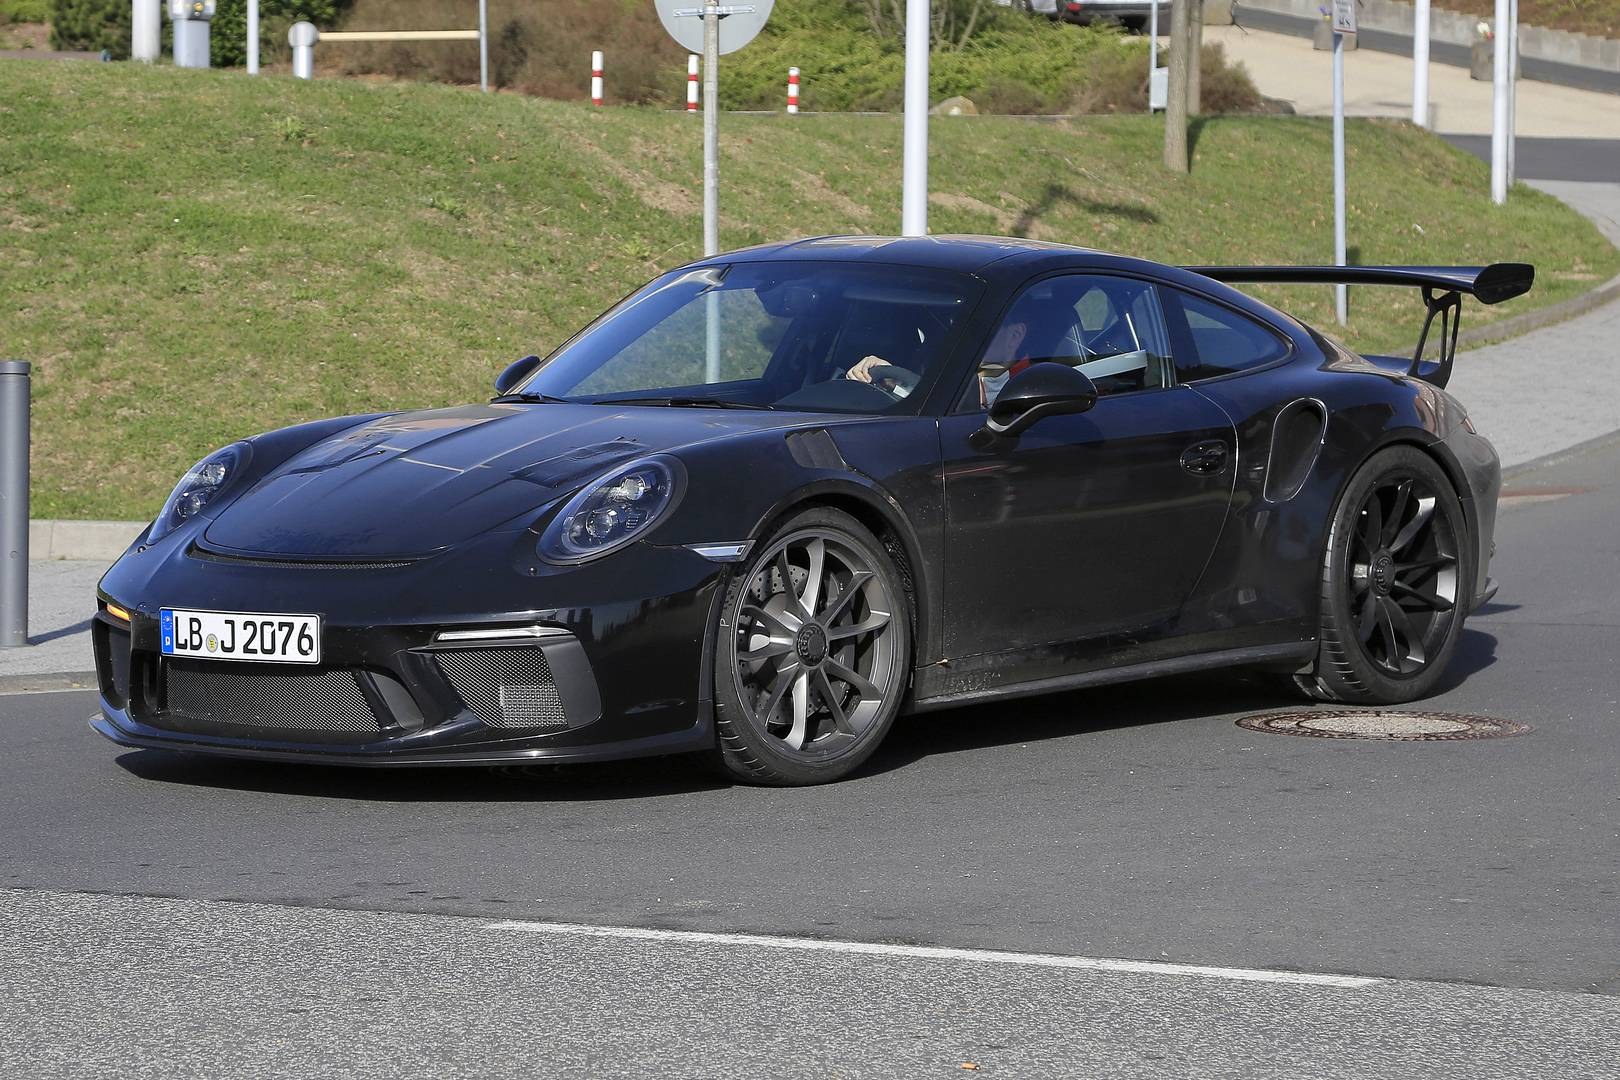 2019 Porsche 911 GT3 RS '4.2' Latest Spy Shots - GTspirit